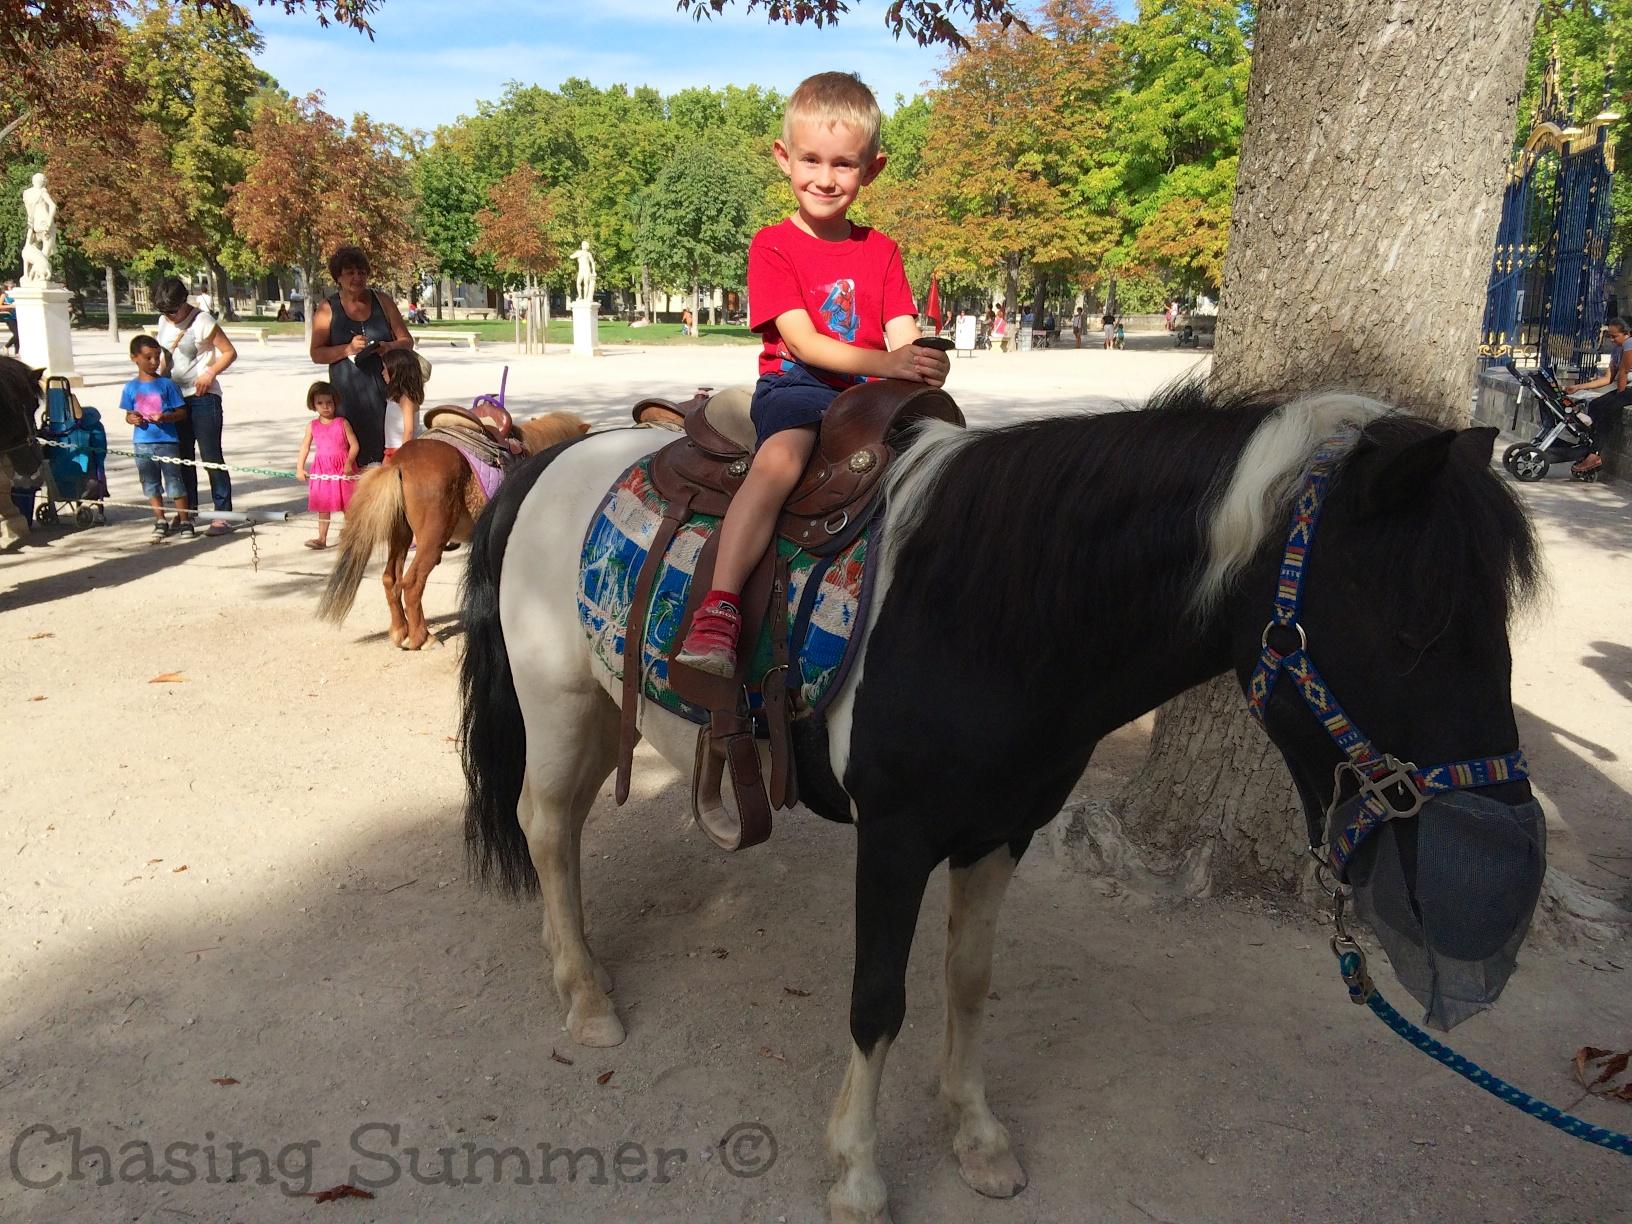 Kian on his pony